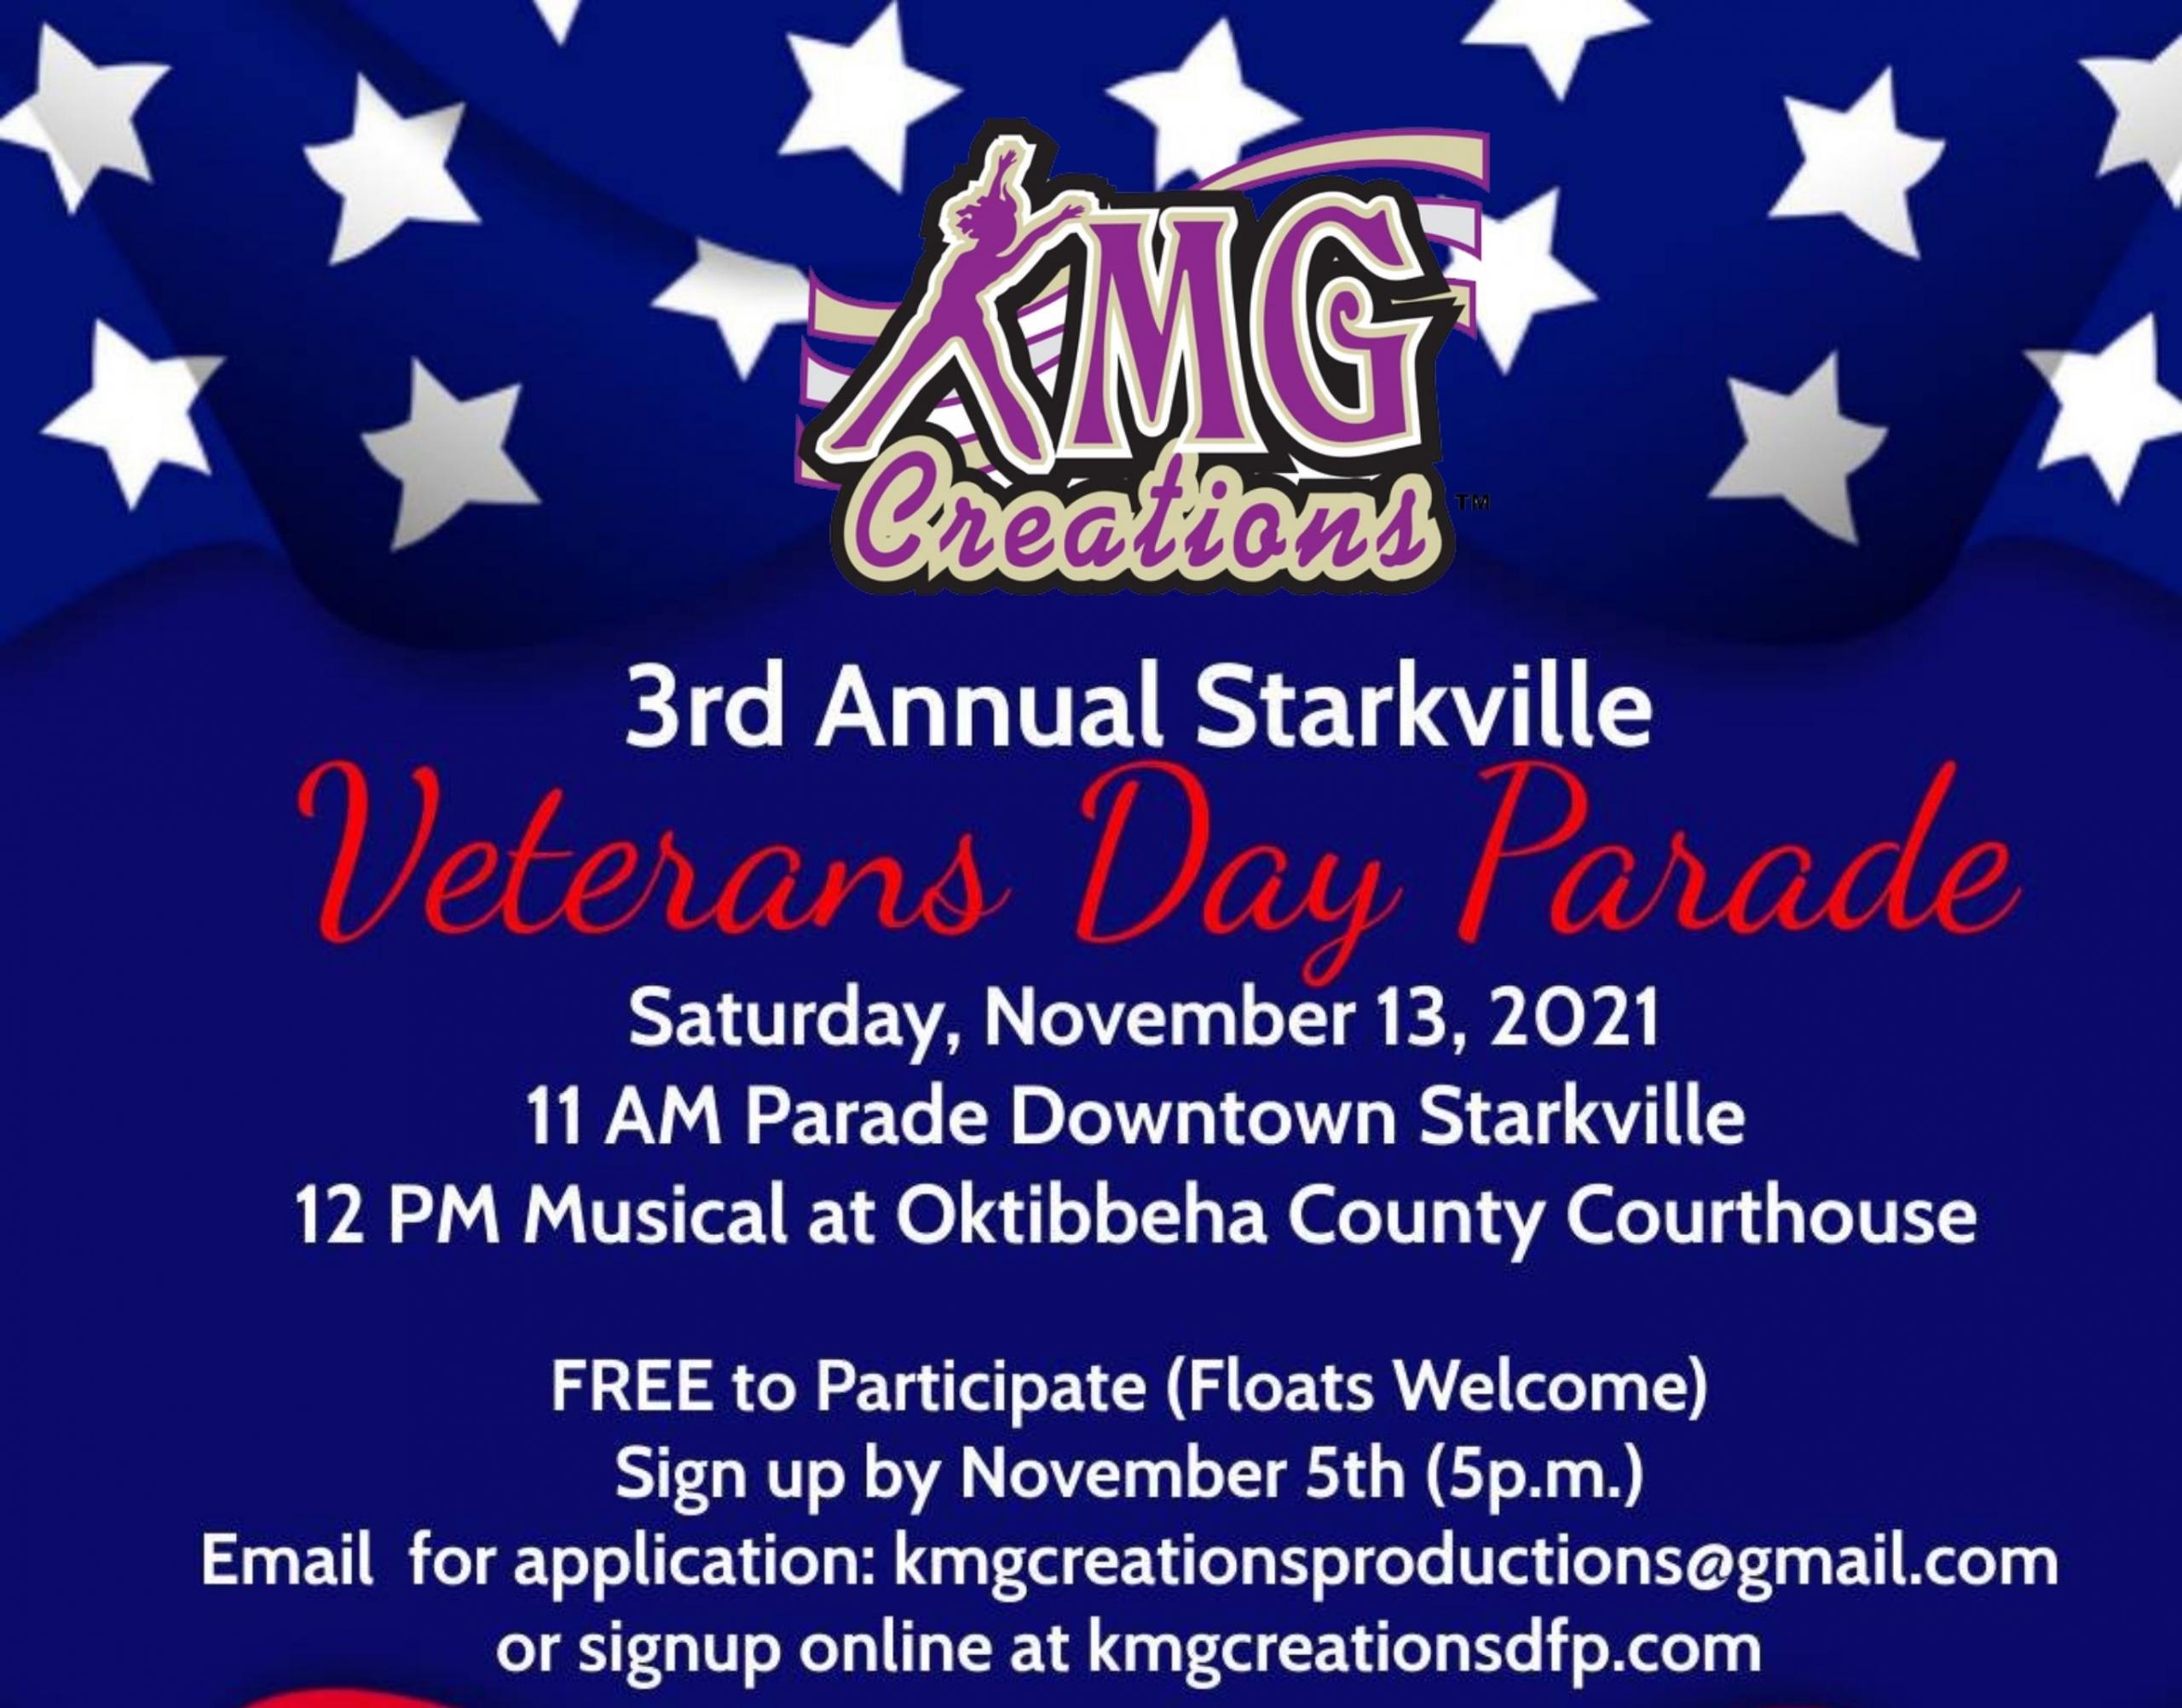 Starkville Veteran's Day Parade